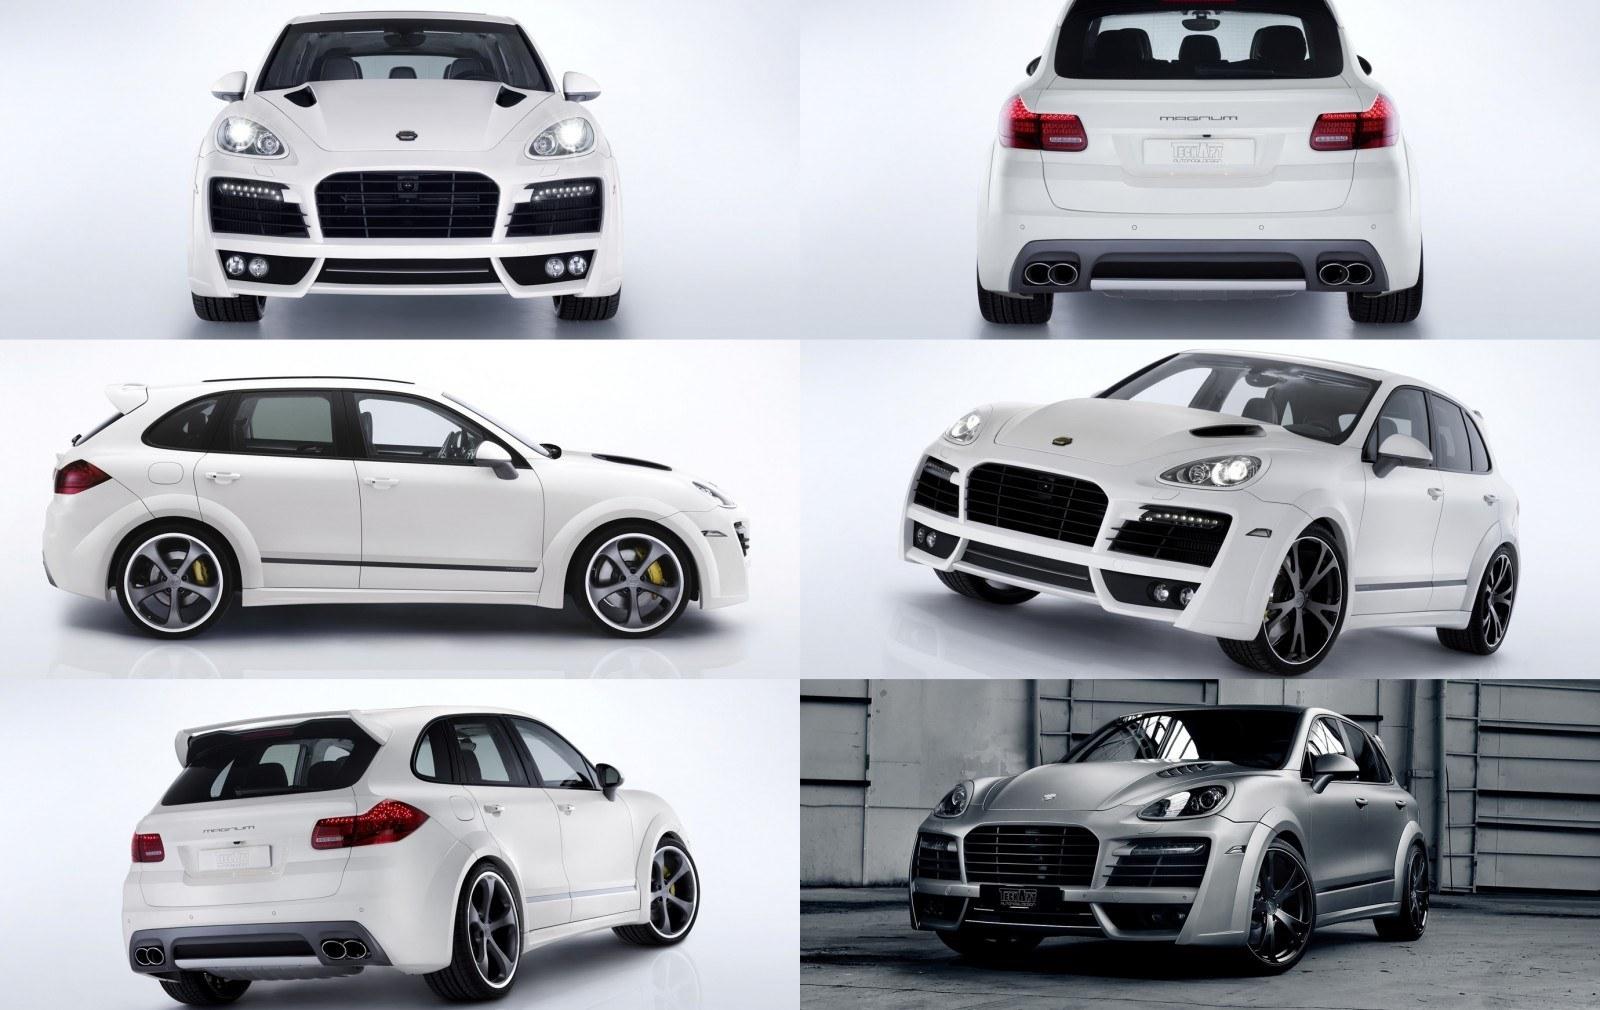 TECHART_Magnum_for_Porsche_Cayenne_models_exterior3-tile